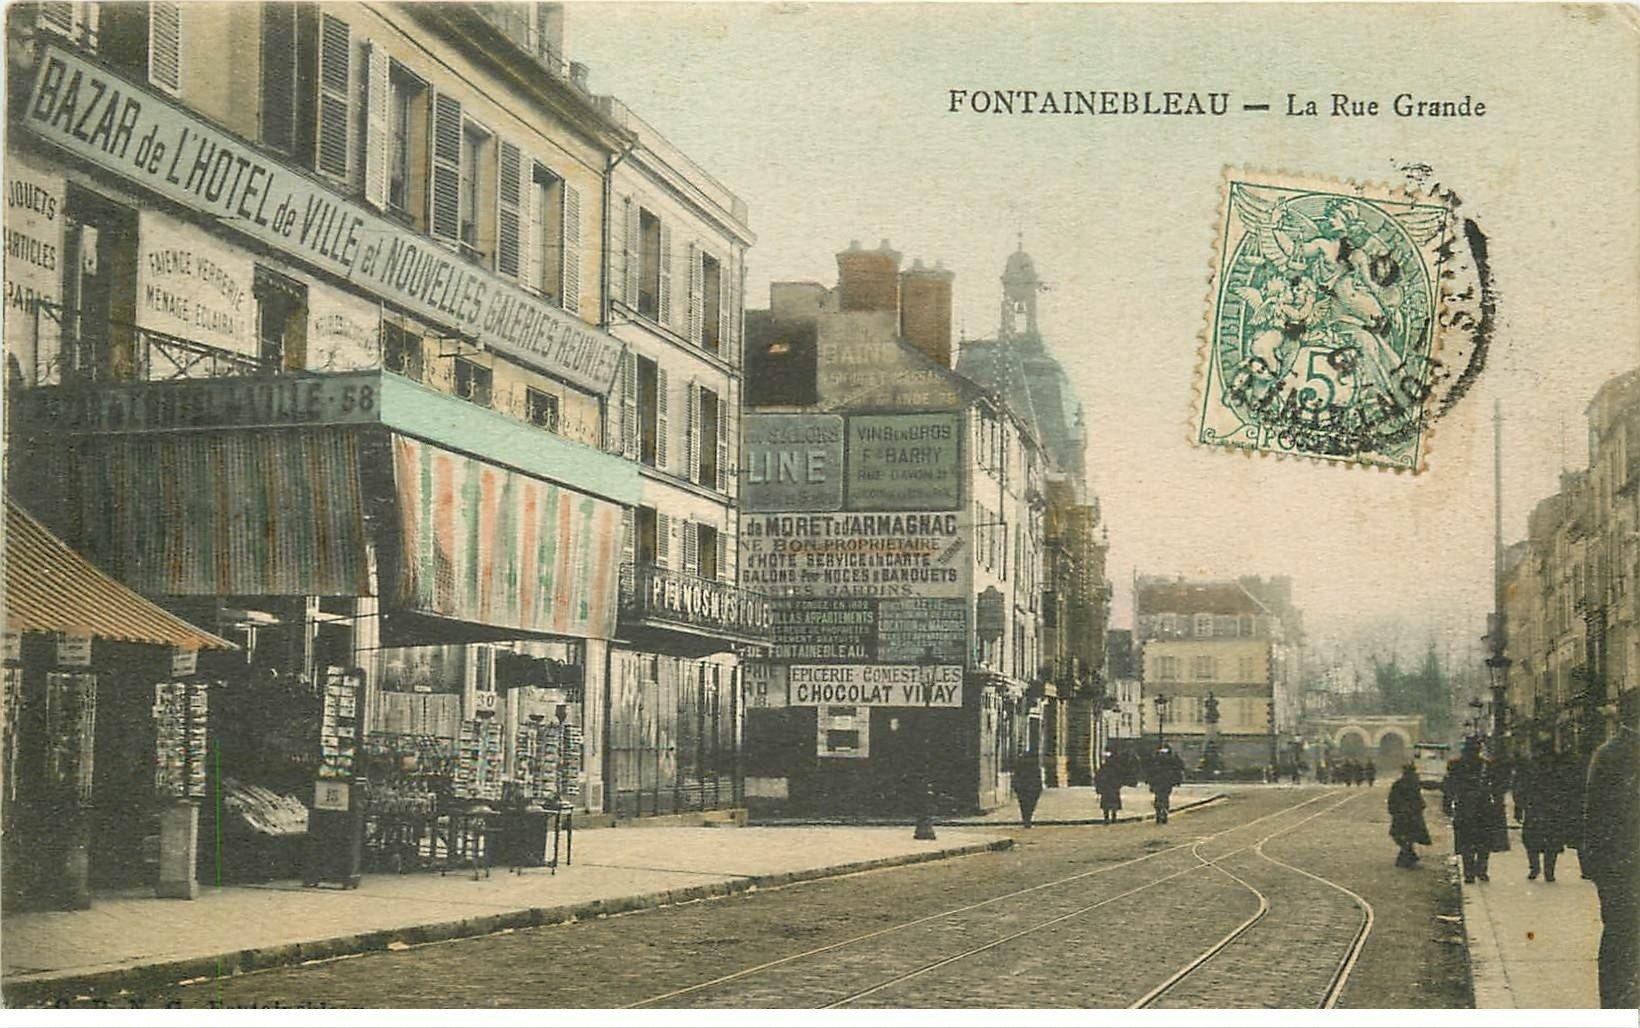 77 fontainebleau grande rue 1906 cartes postale au bazar - Hotel fontainebleau piscine ...